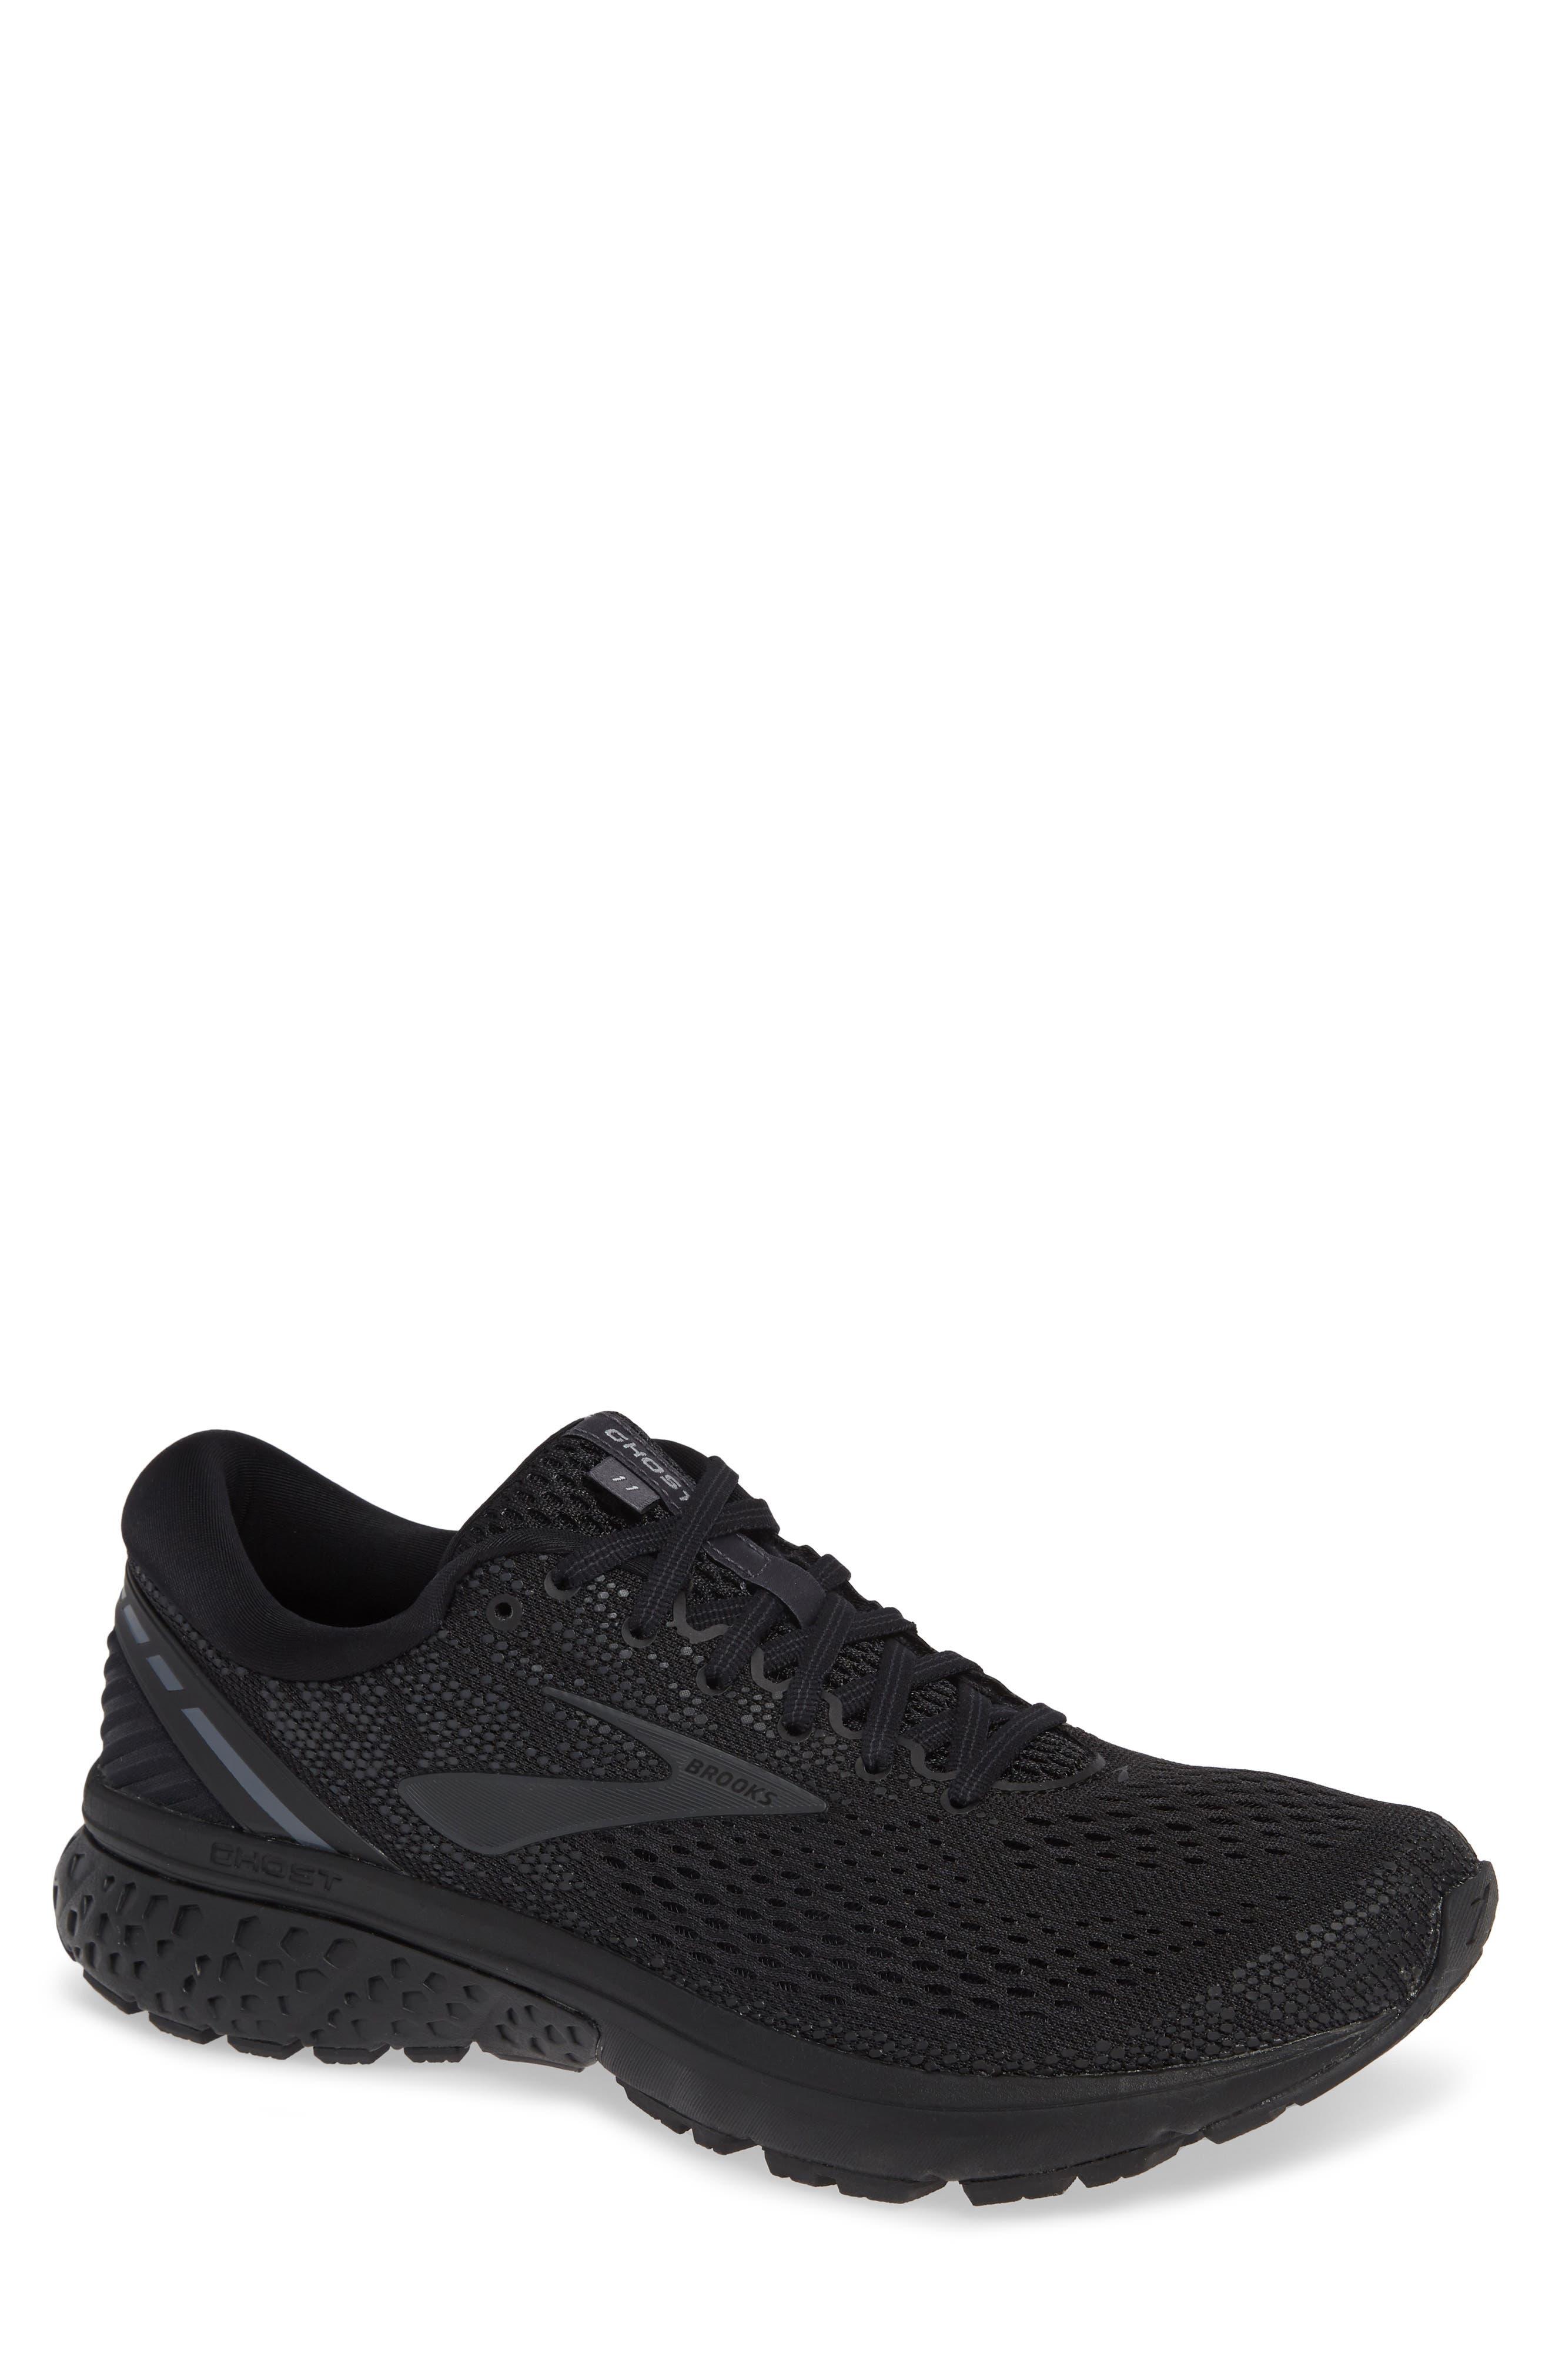 Ghost 11 Running Shoe, Main, color, BLACK/ EBONY